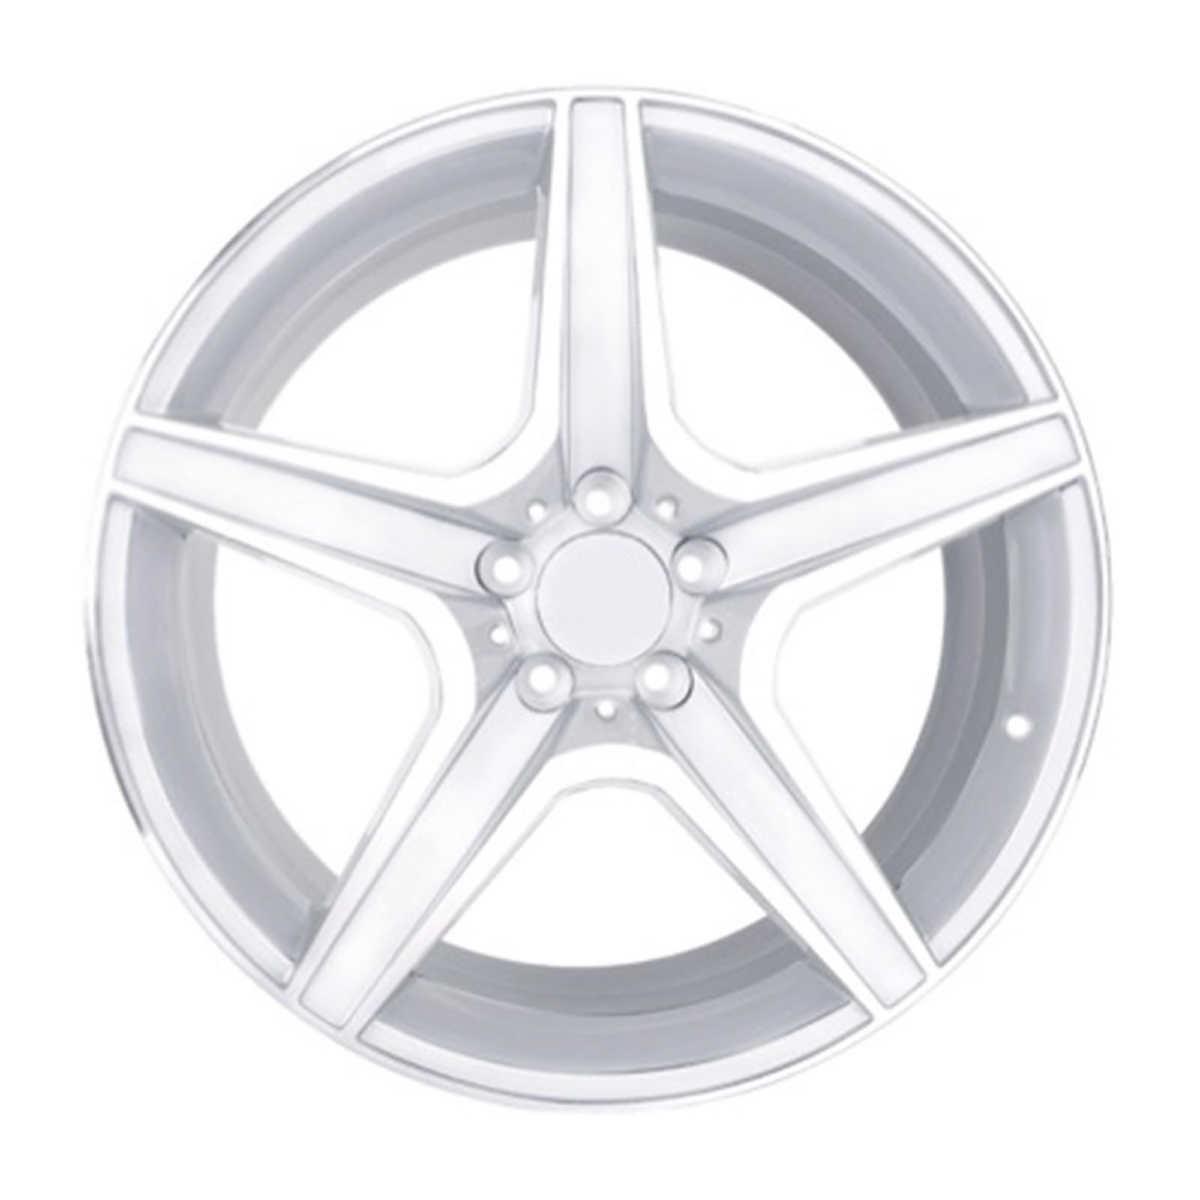 Briway Radial Trailer Tire Mounted On White Spoke Steel Rim